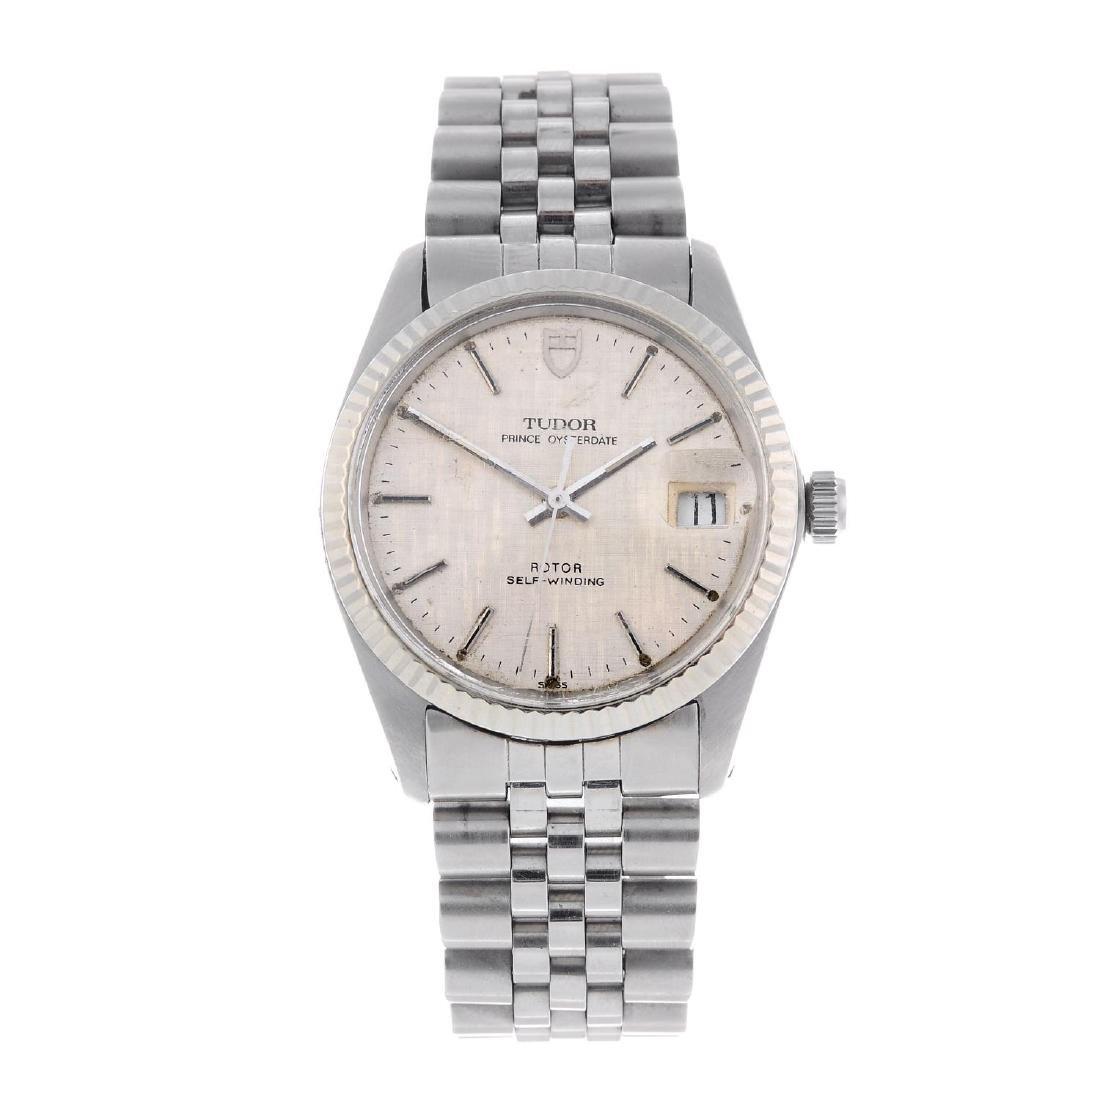 TUDOR - a gentleman's Prince Oysterdate bracelet watch.